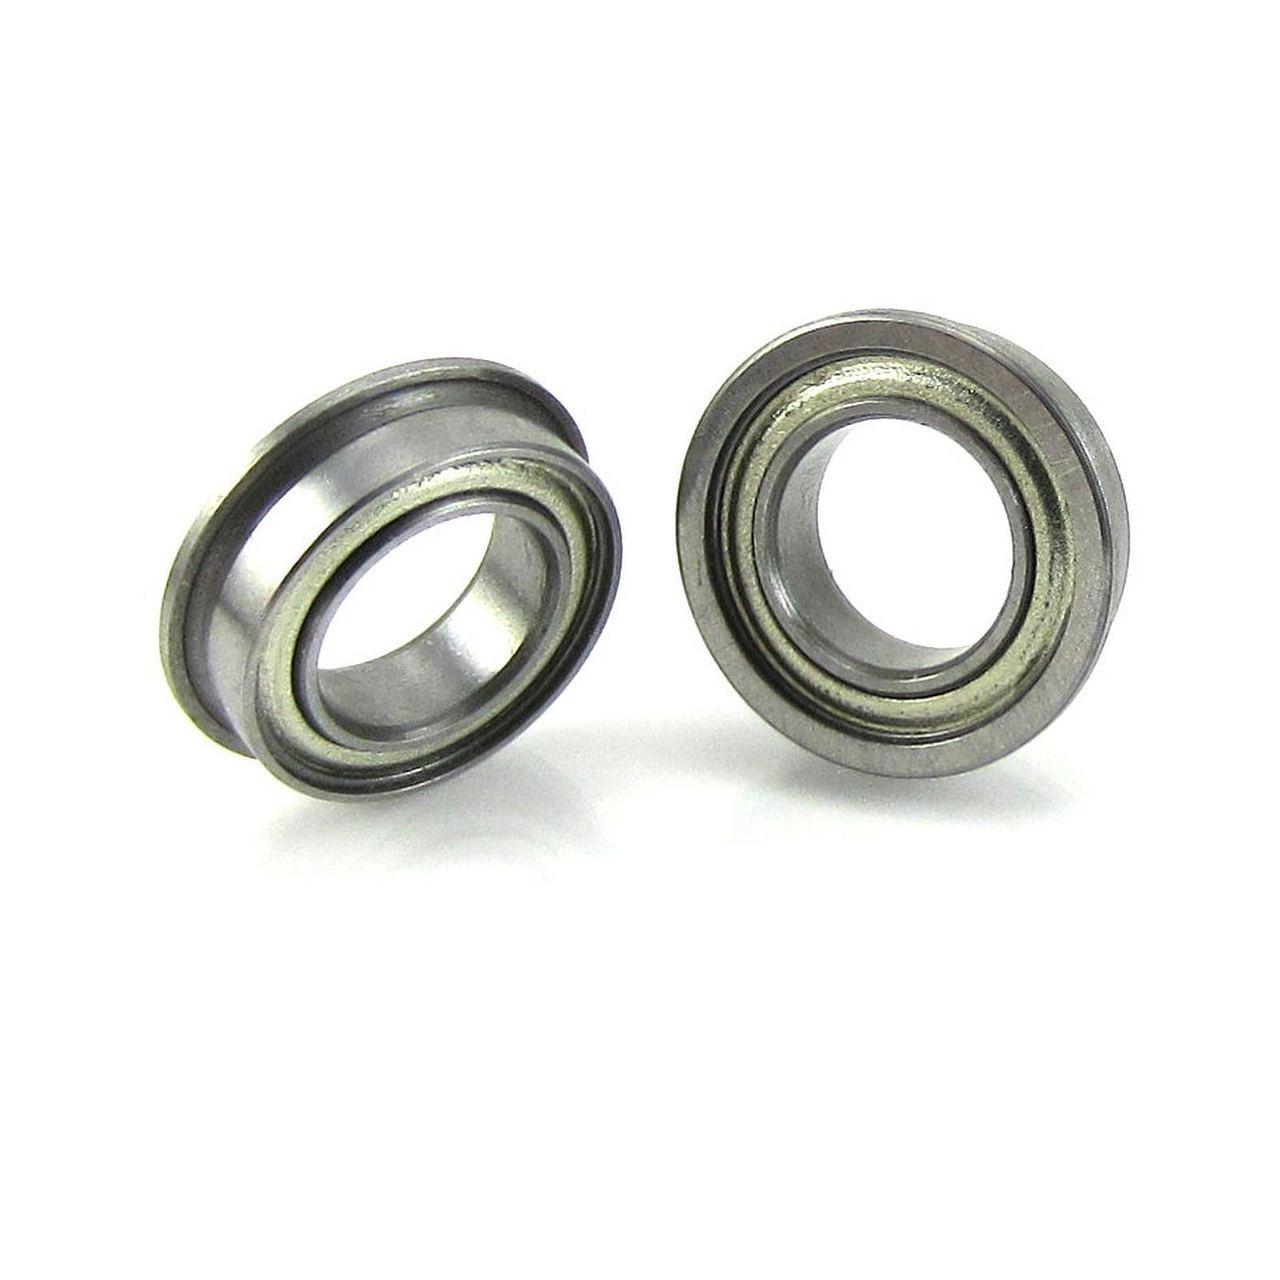 TRB RC 6x10x3mm Flanged Precision Ball Bearings ABEC 3 Metal Shields (2)